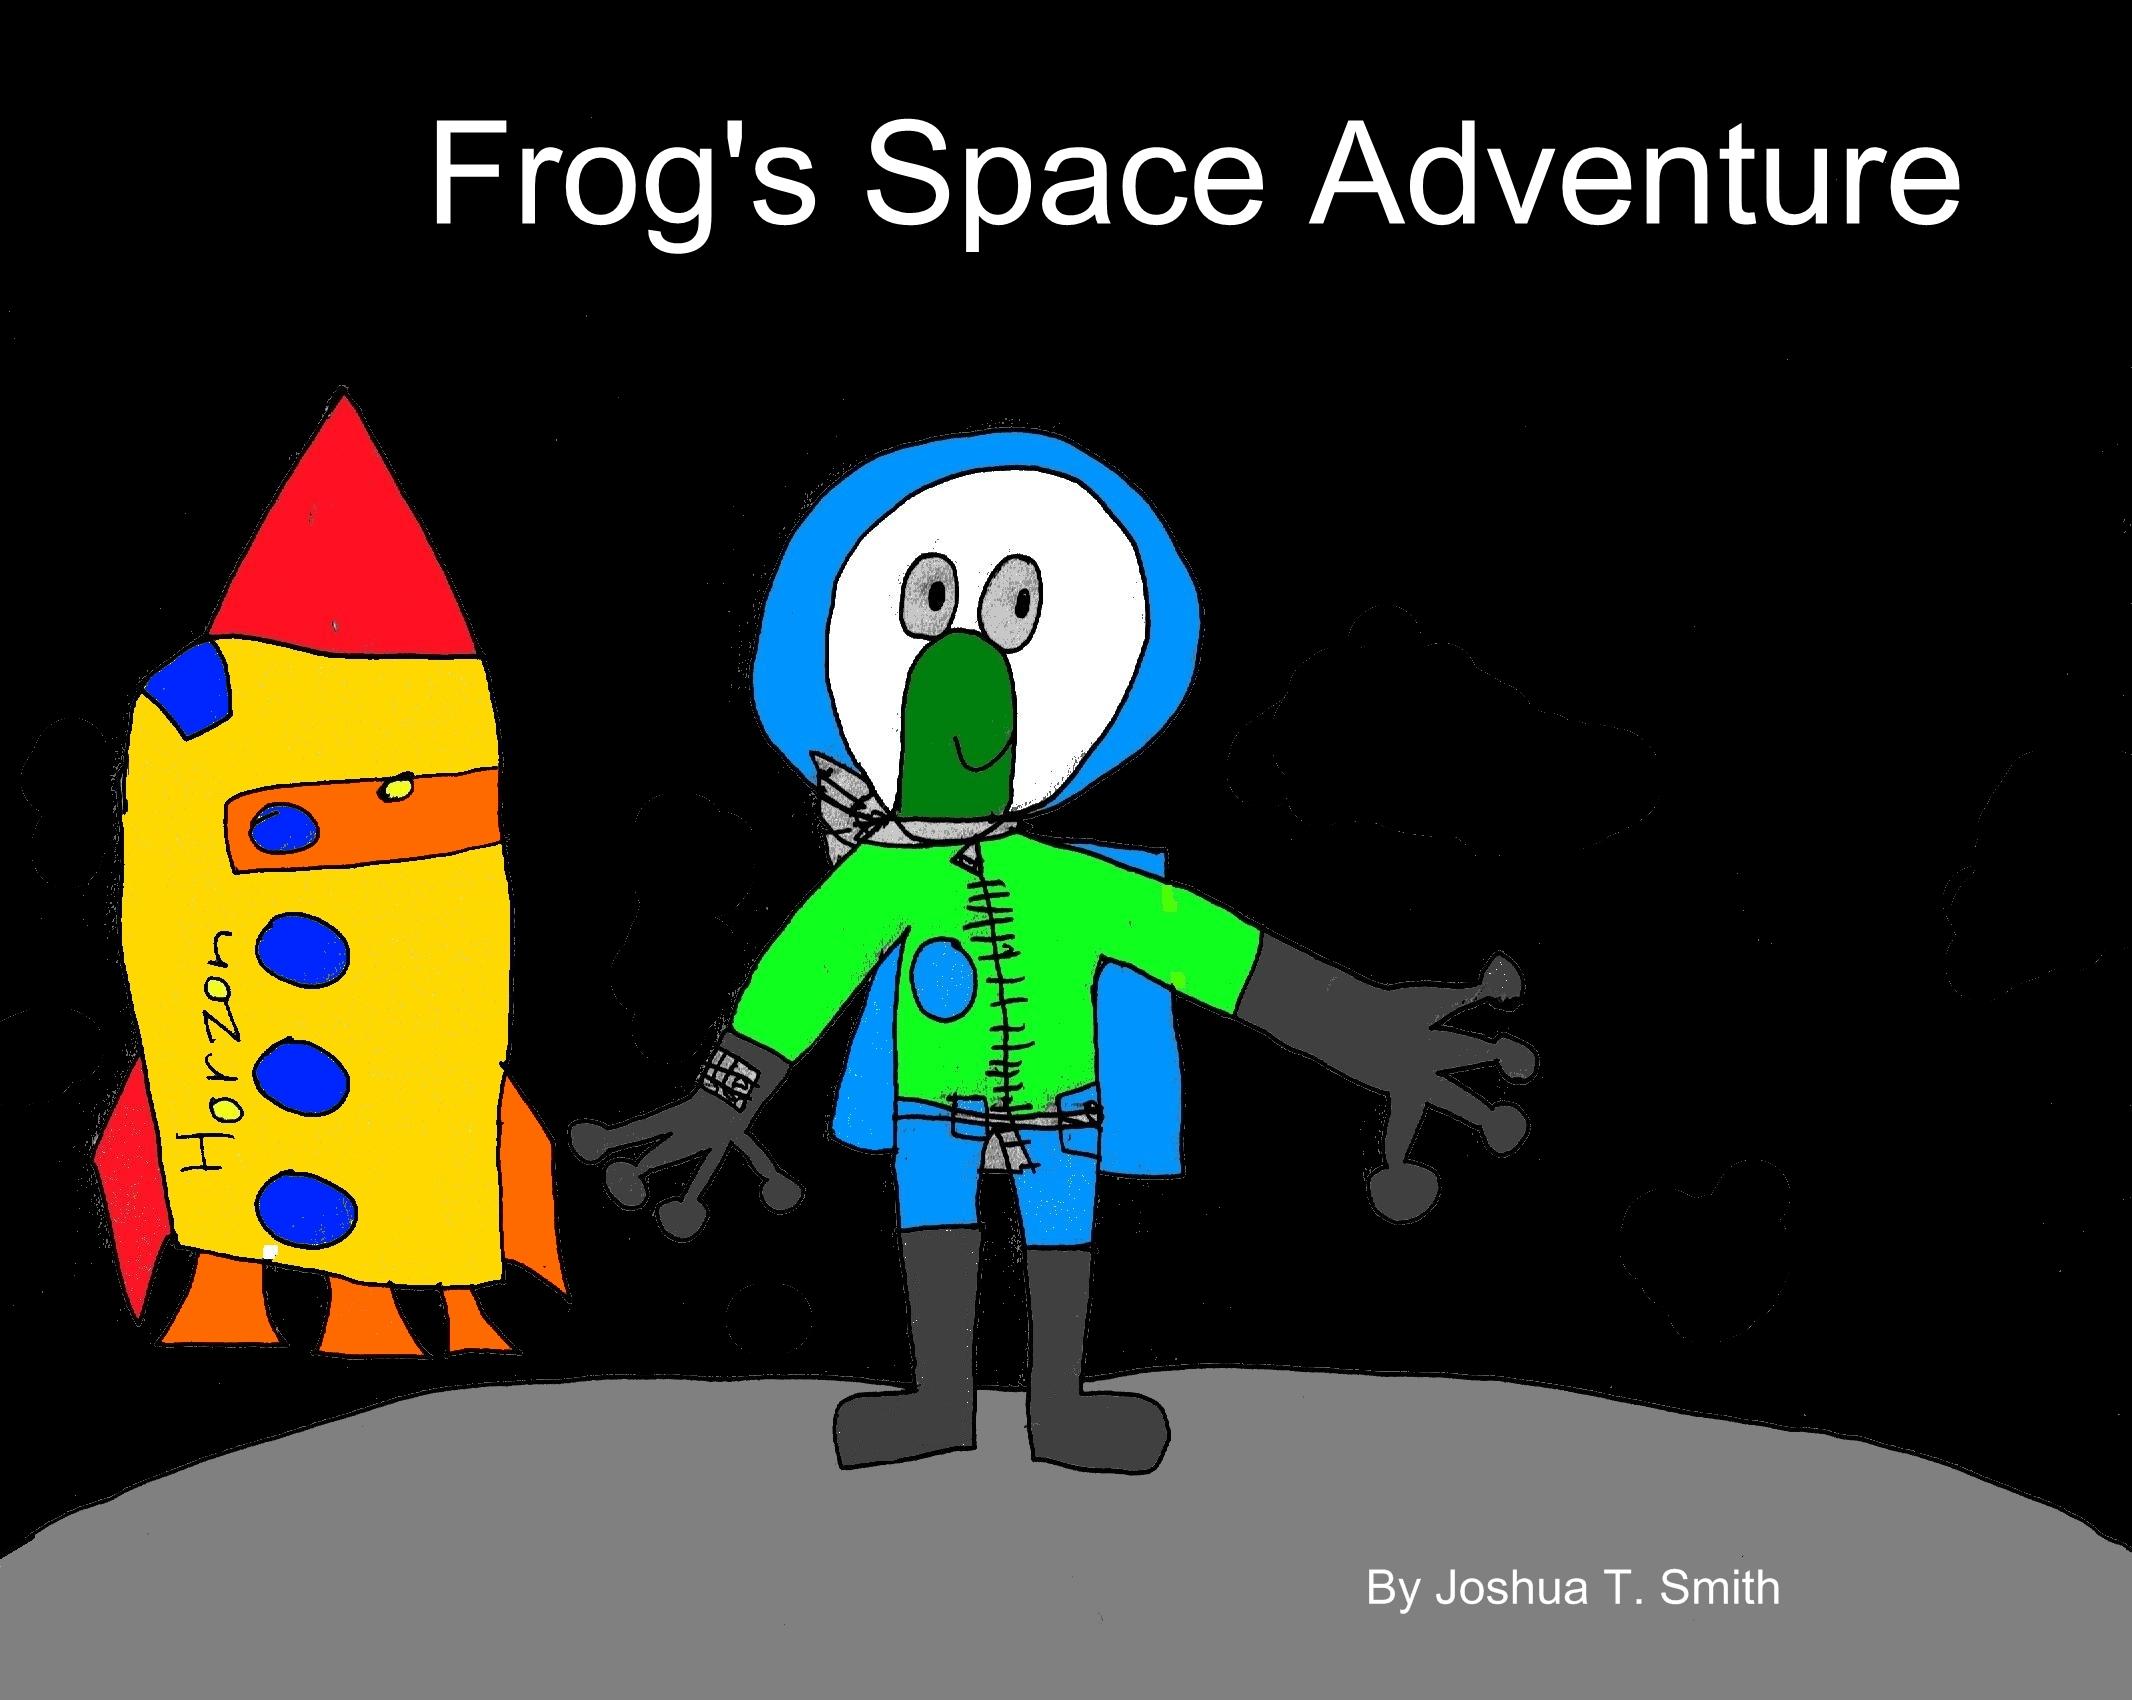 Frog's Space Adventure